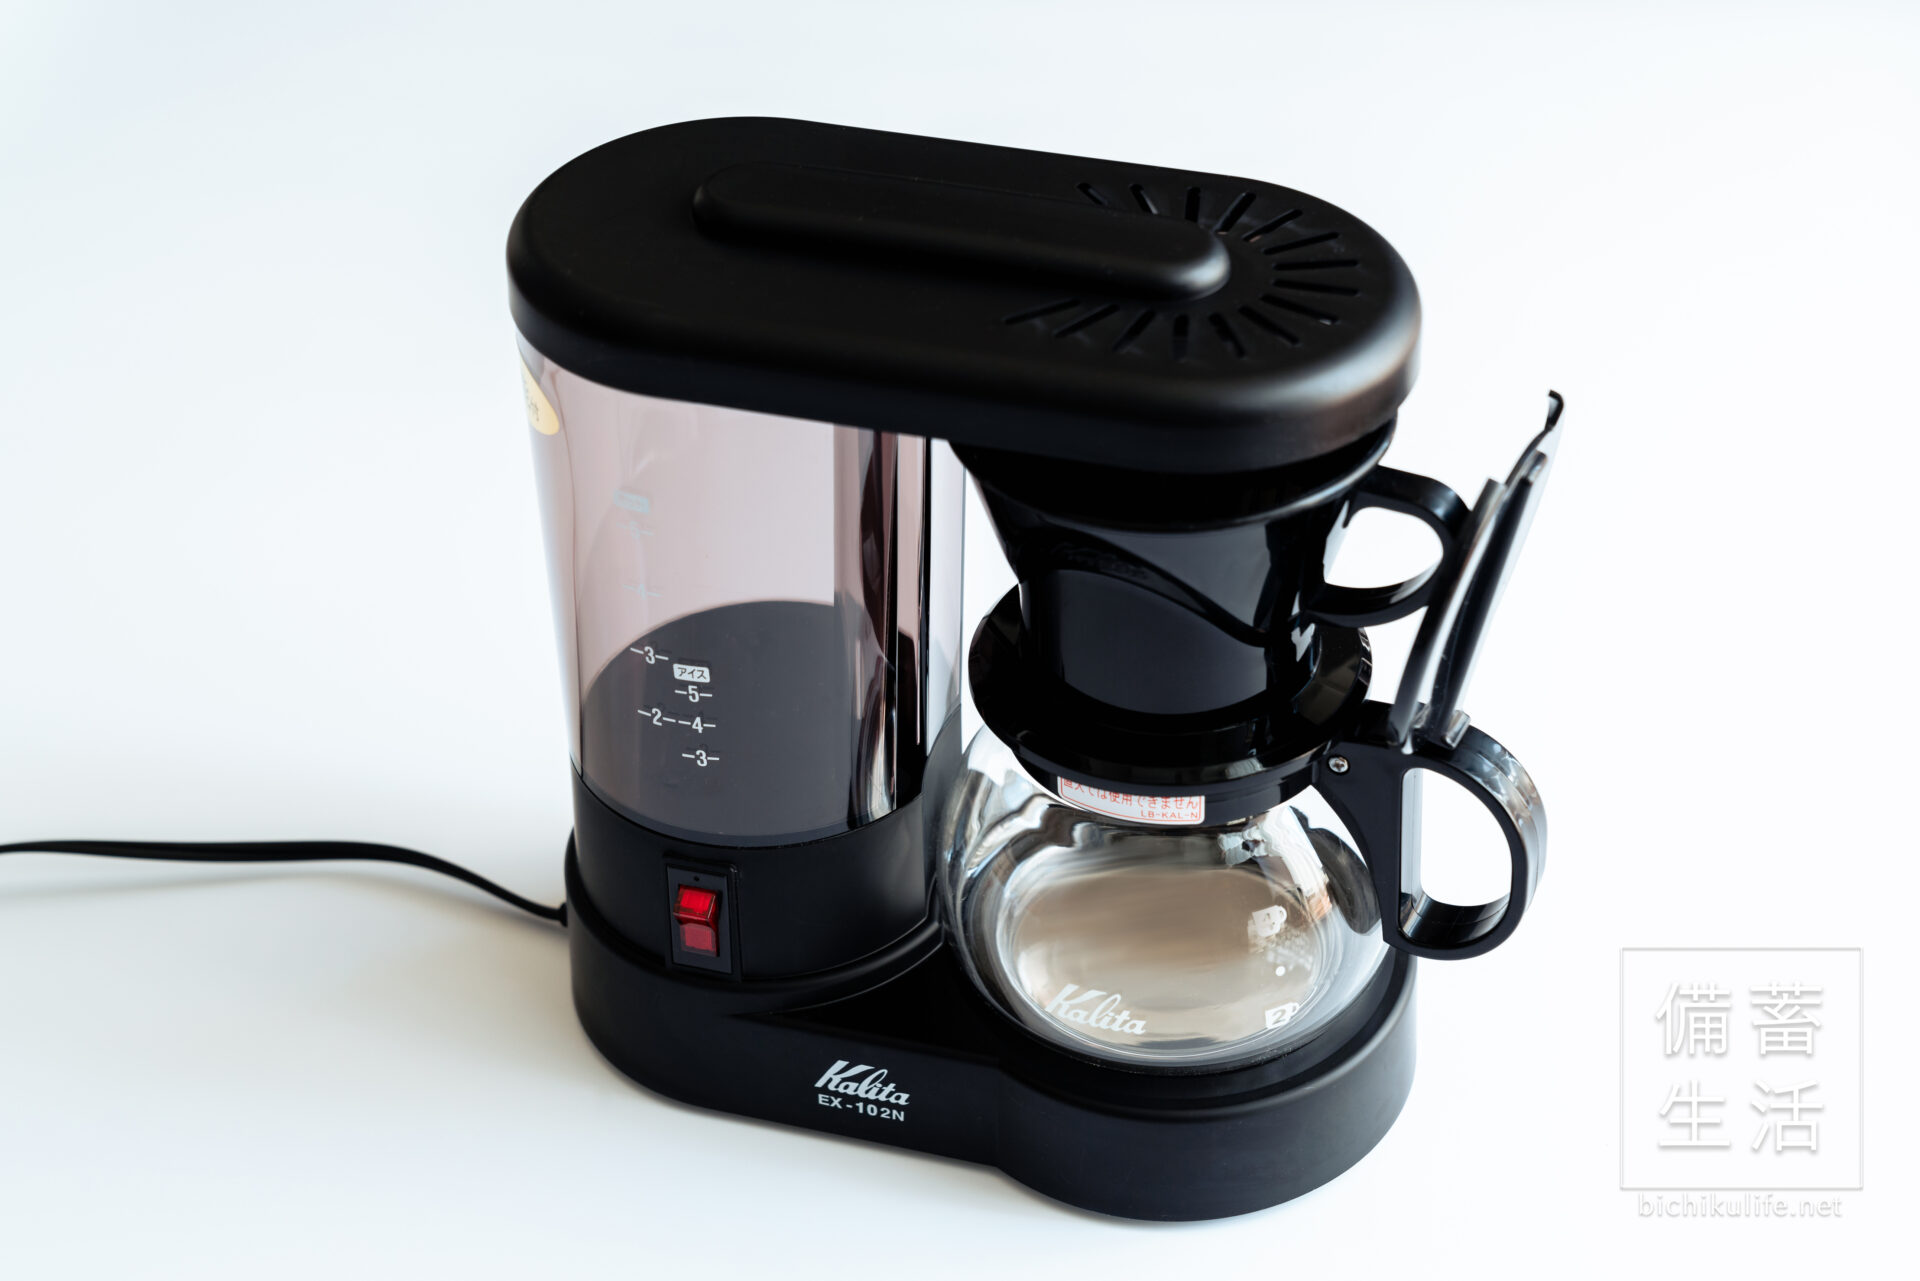 Kalita(カリタ)のコーヒーマシン EX-102N